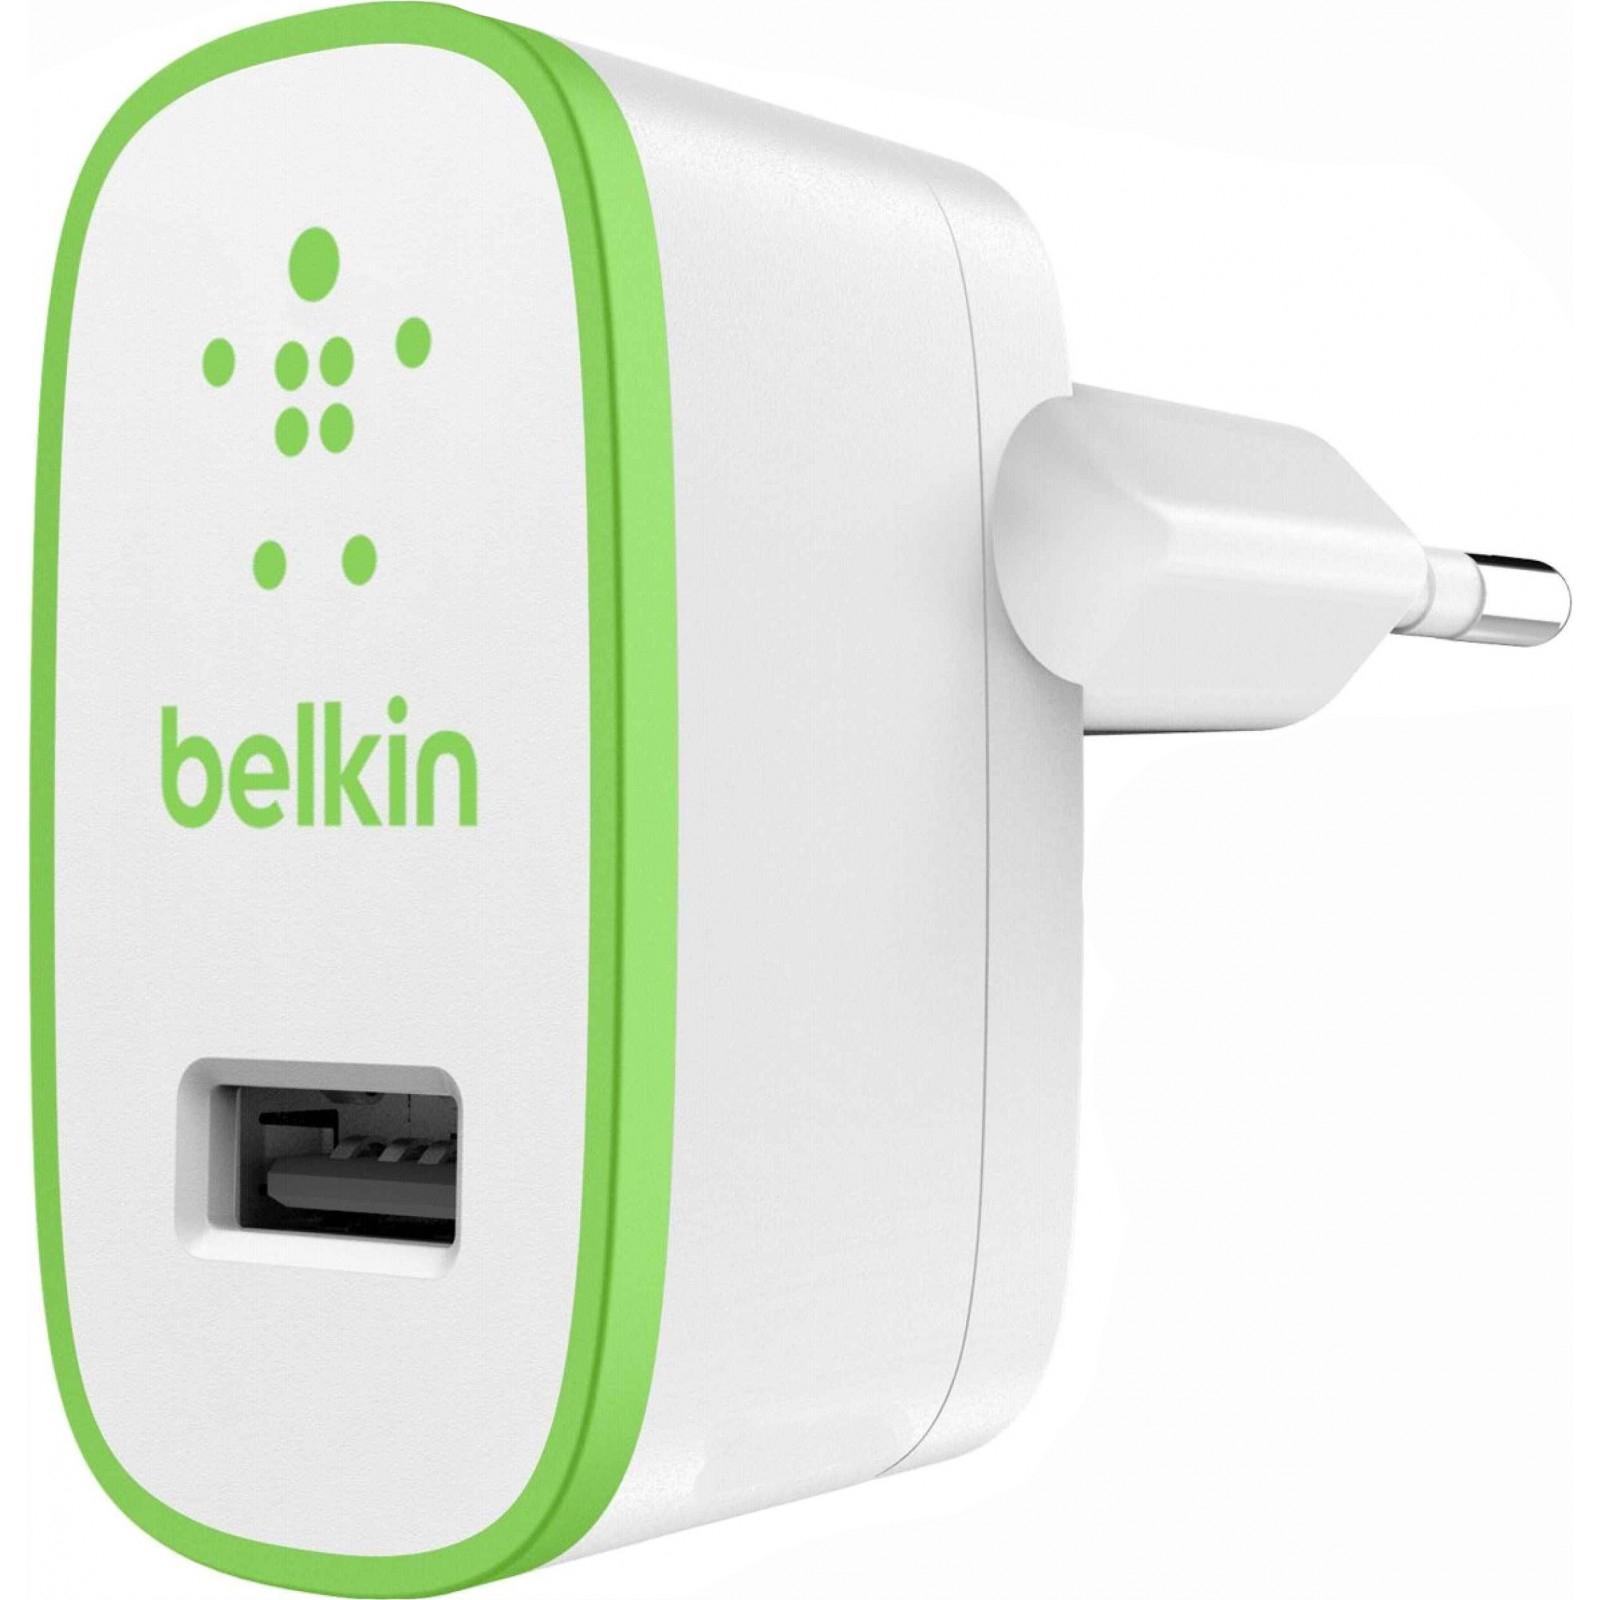 Зарядное устройство Belkin USB Home Charger (220V, 1*USB 5V/2.4A) (F8J040vfWHT)